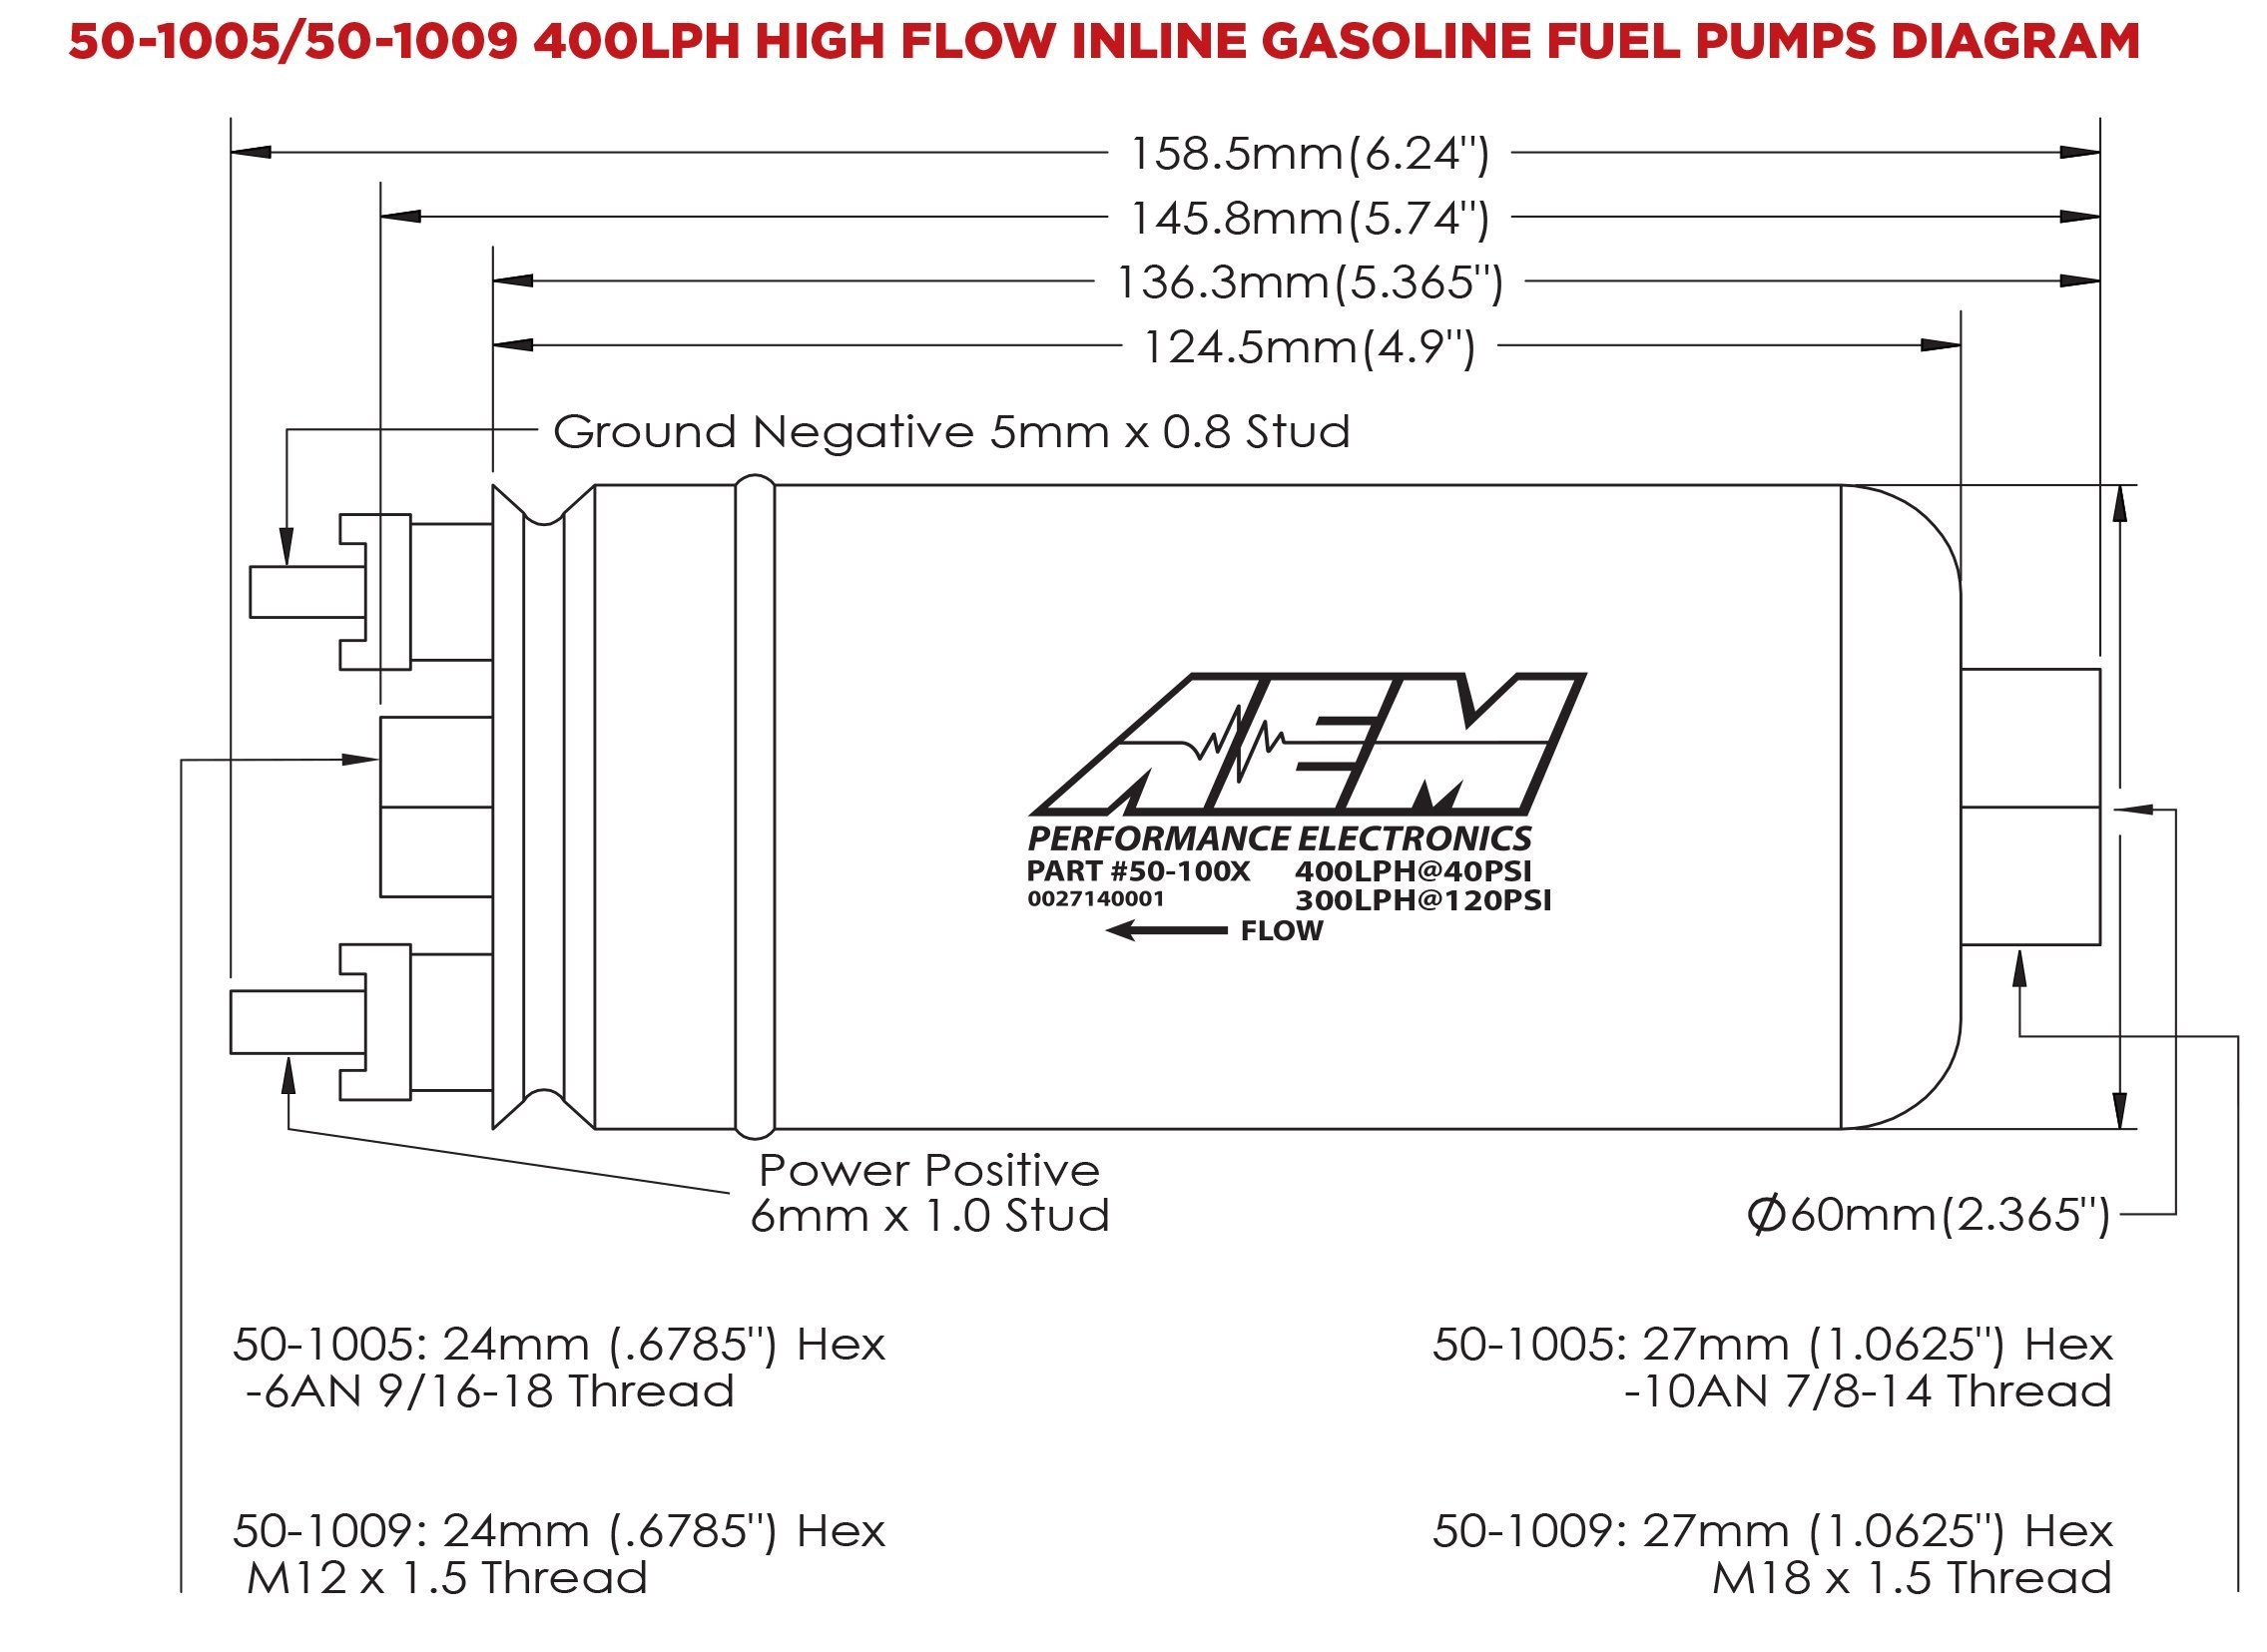 Gas Turbine Engine Fuel System Block Diagram Aem Metric High Flow Inline Fuel Pump 400lph Of Gas Turbine Engine Fuel System Block Diagram